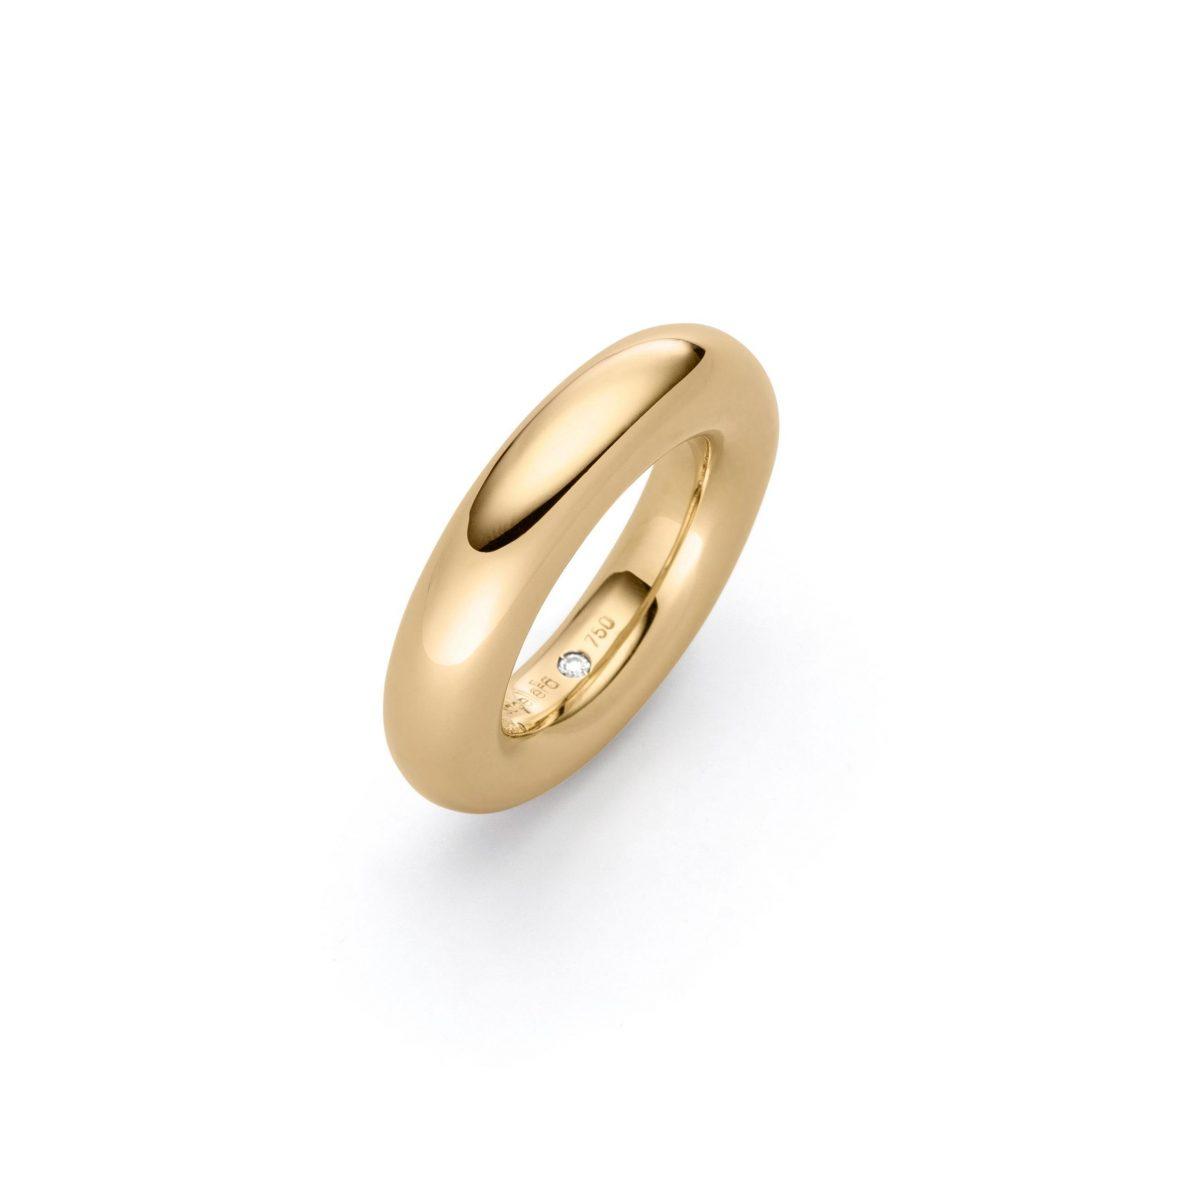 Ring Rotond 18ct Roségold - IsabelleFa - 02024/07RI